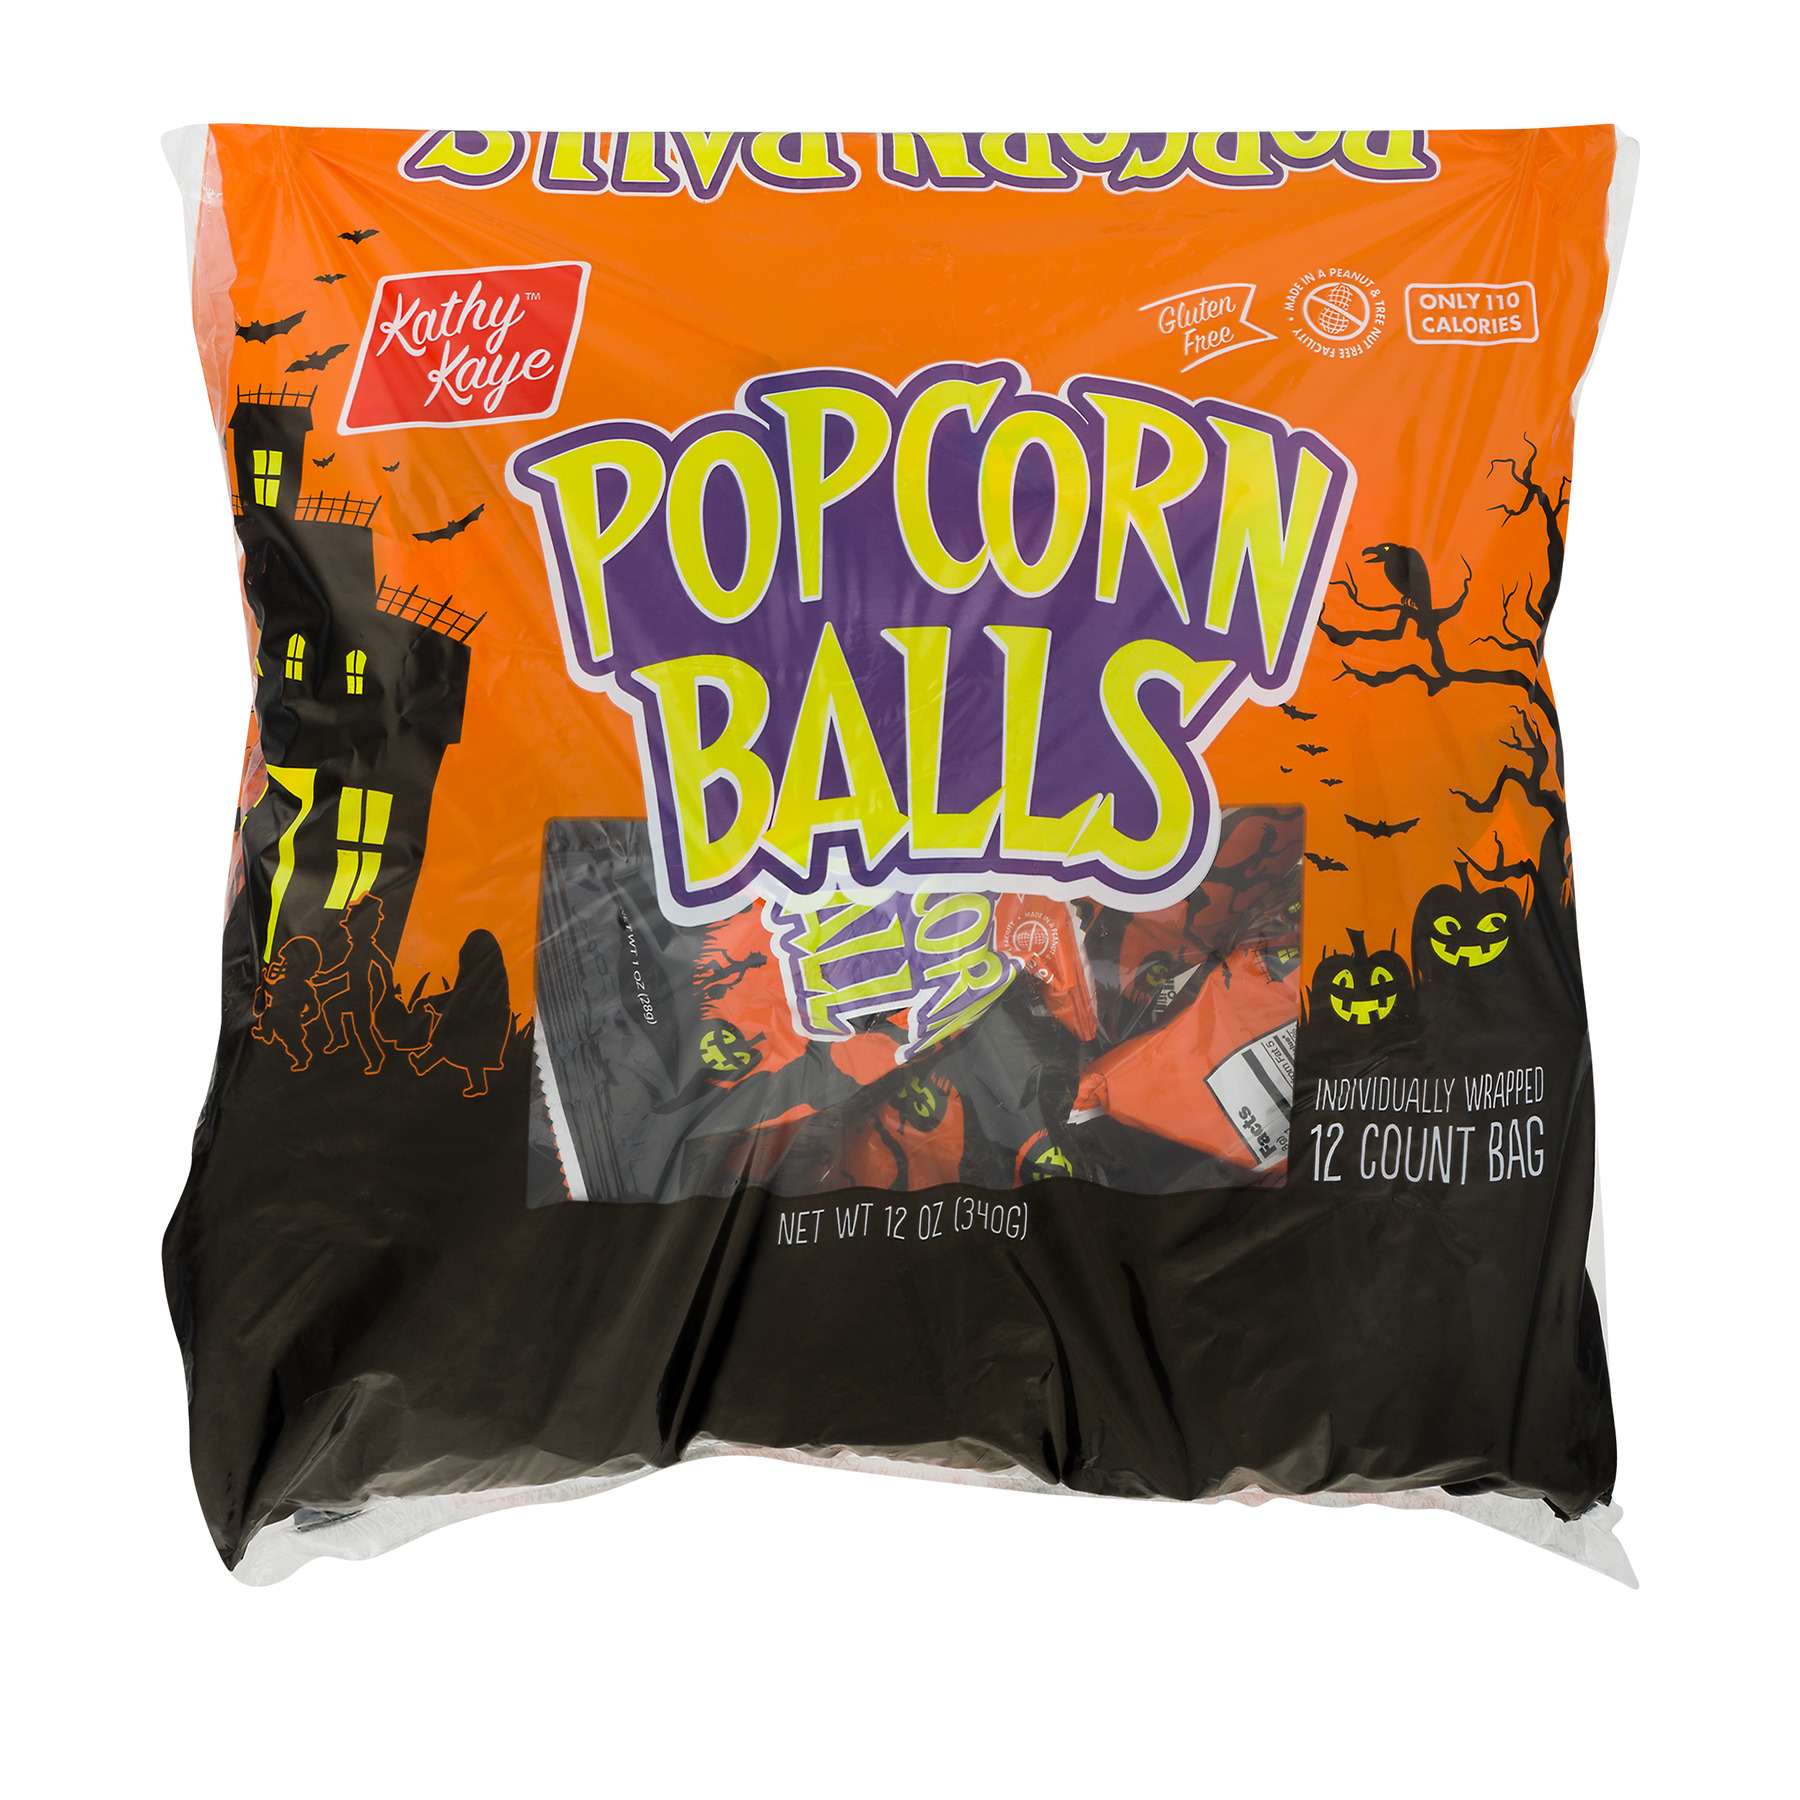 Kathy Kaye Halloween Popcorn Balls 1 oz 12 ct Walmart